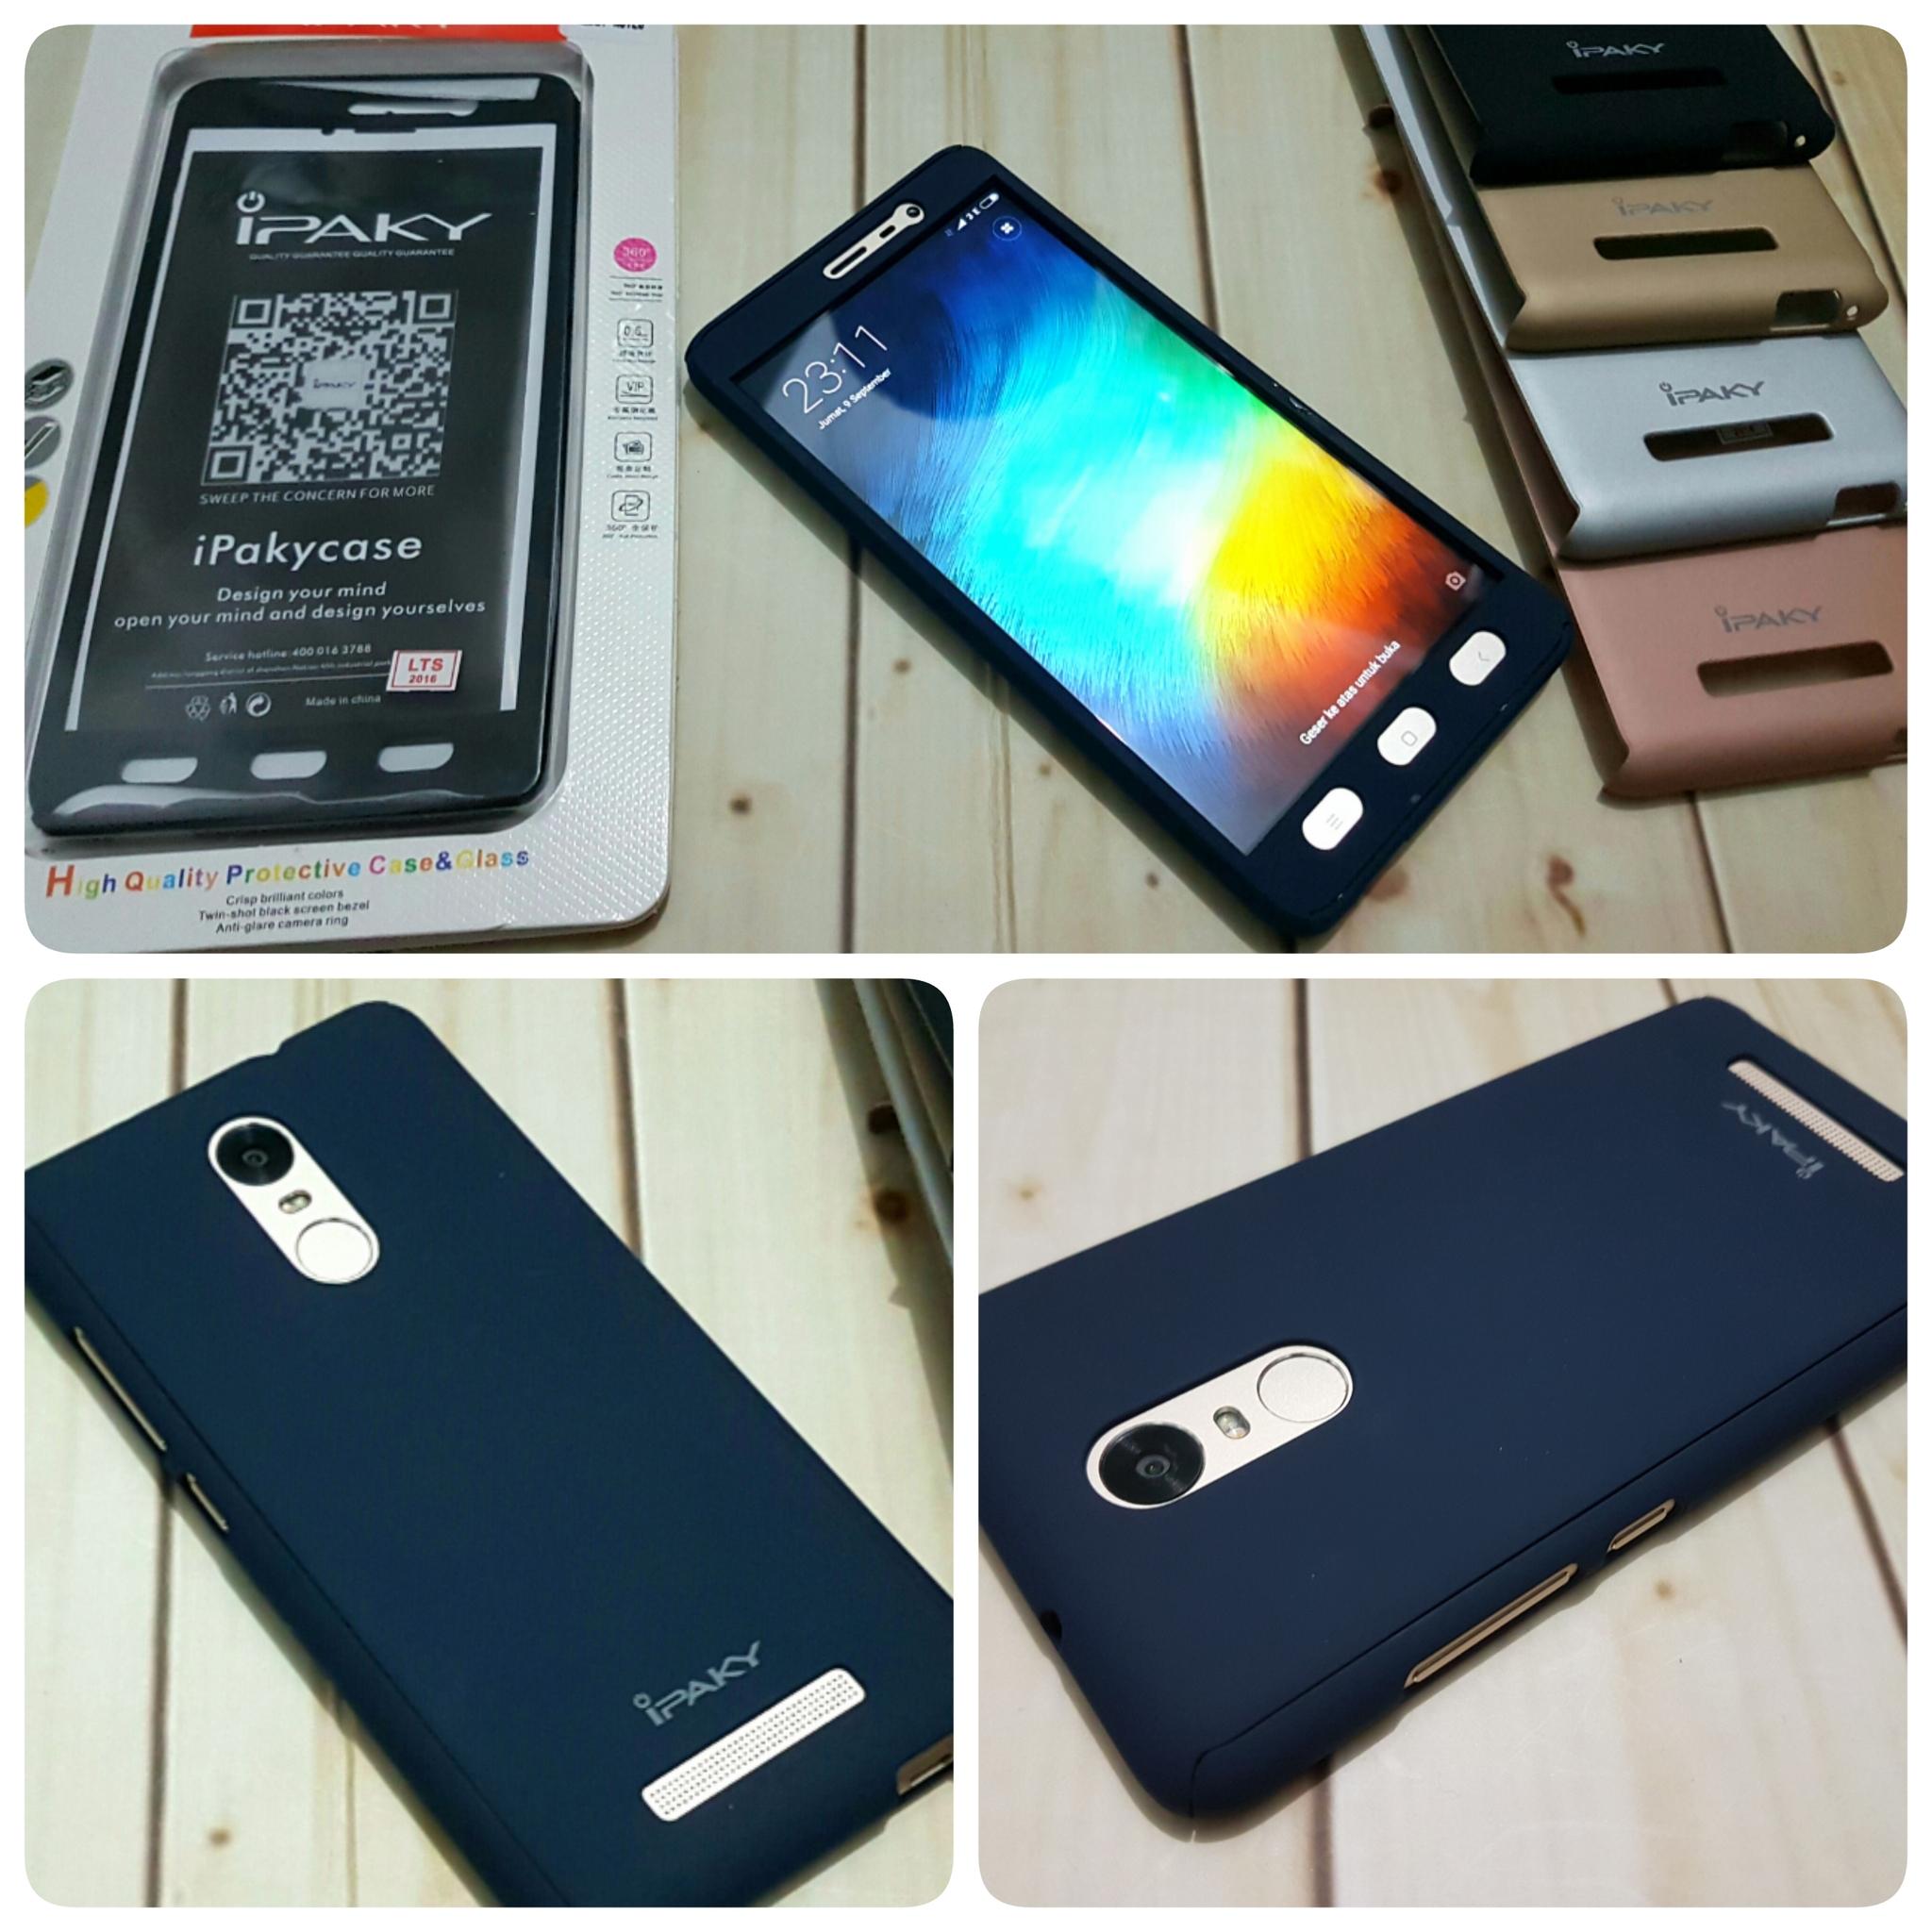 designer fashion 0d951 bfb7d Jual Case Ipaky Xiaomi Redmi Note 4 Full Body 360 Cover Hard ...